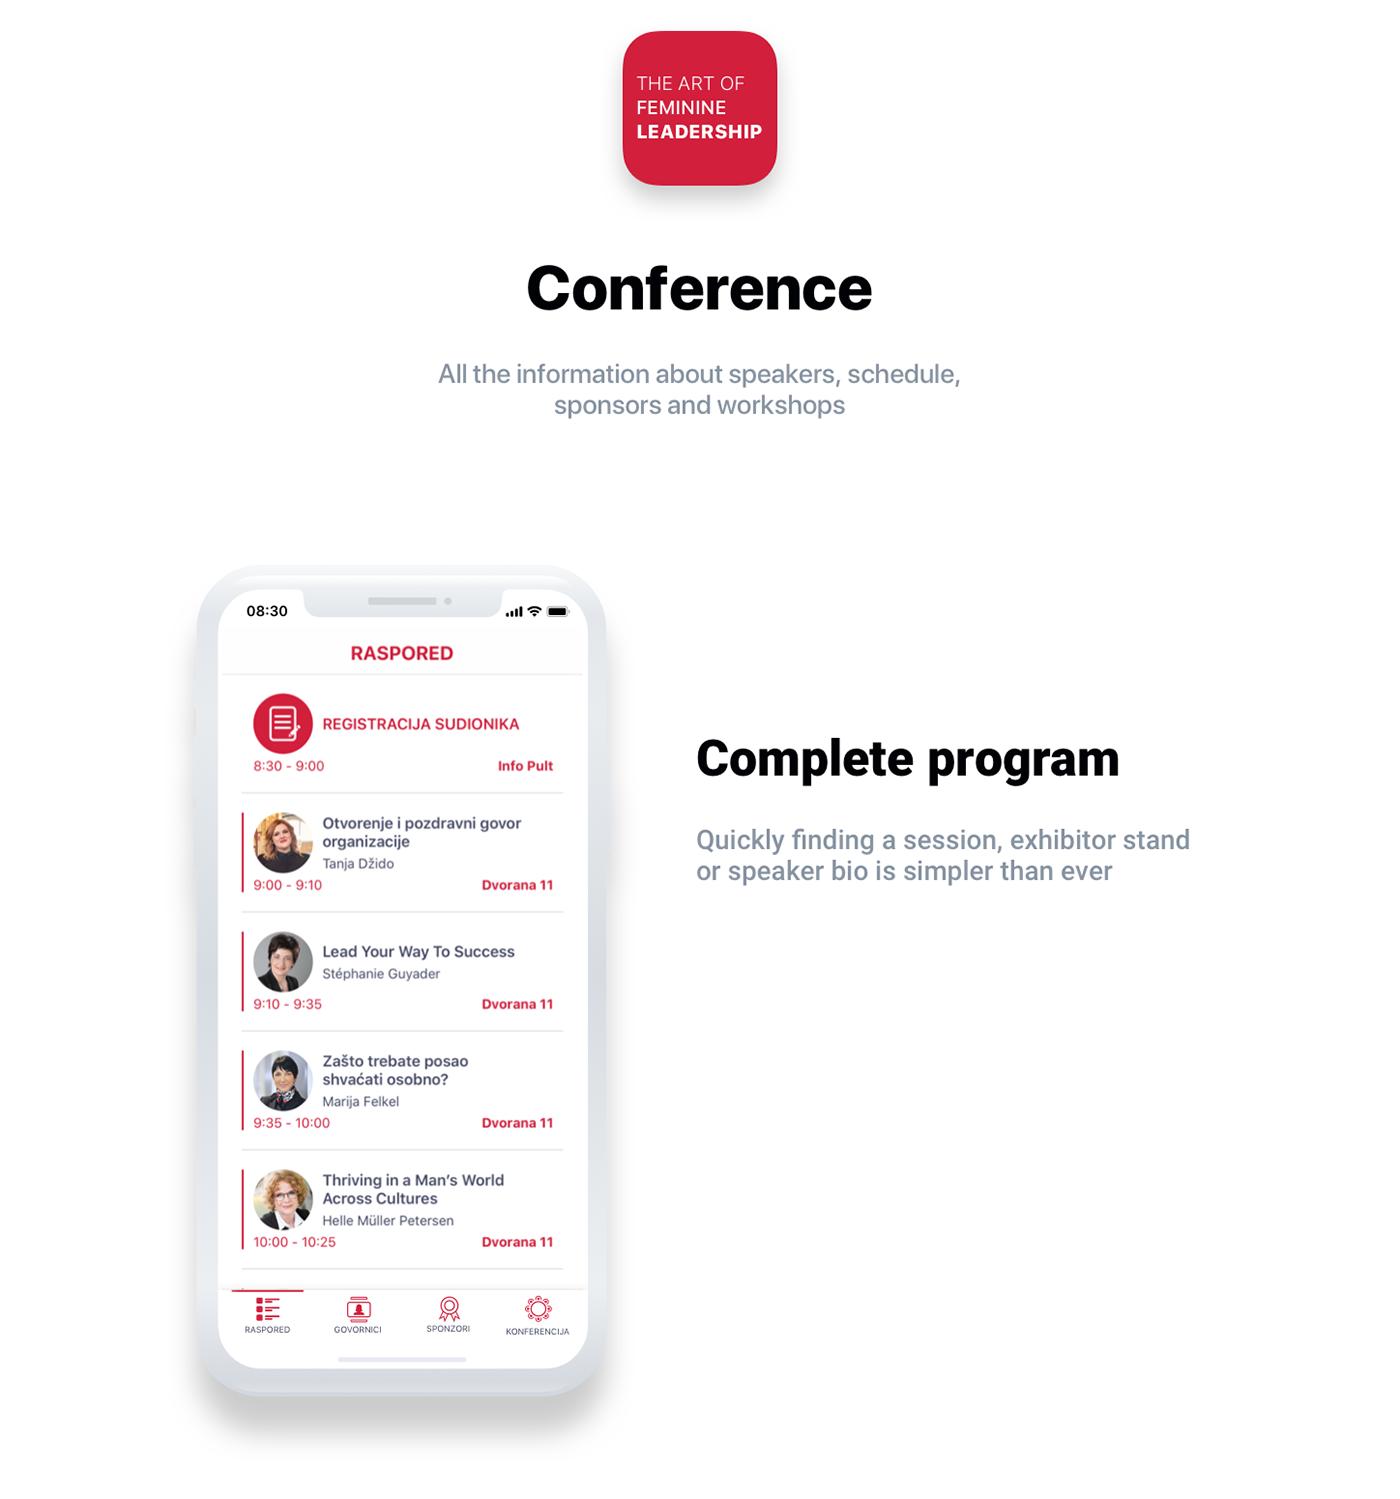 mobile Mobile Application app application ux UI ux/ui uxui conference Event